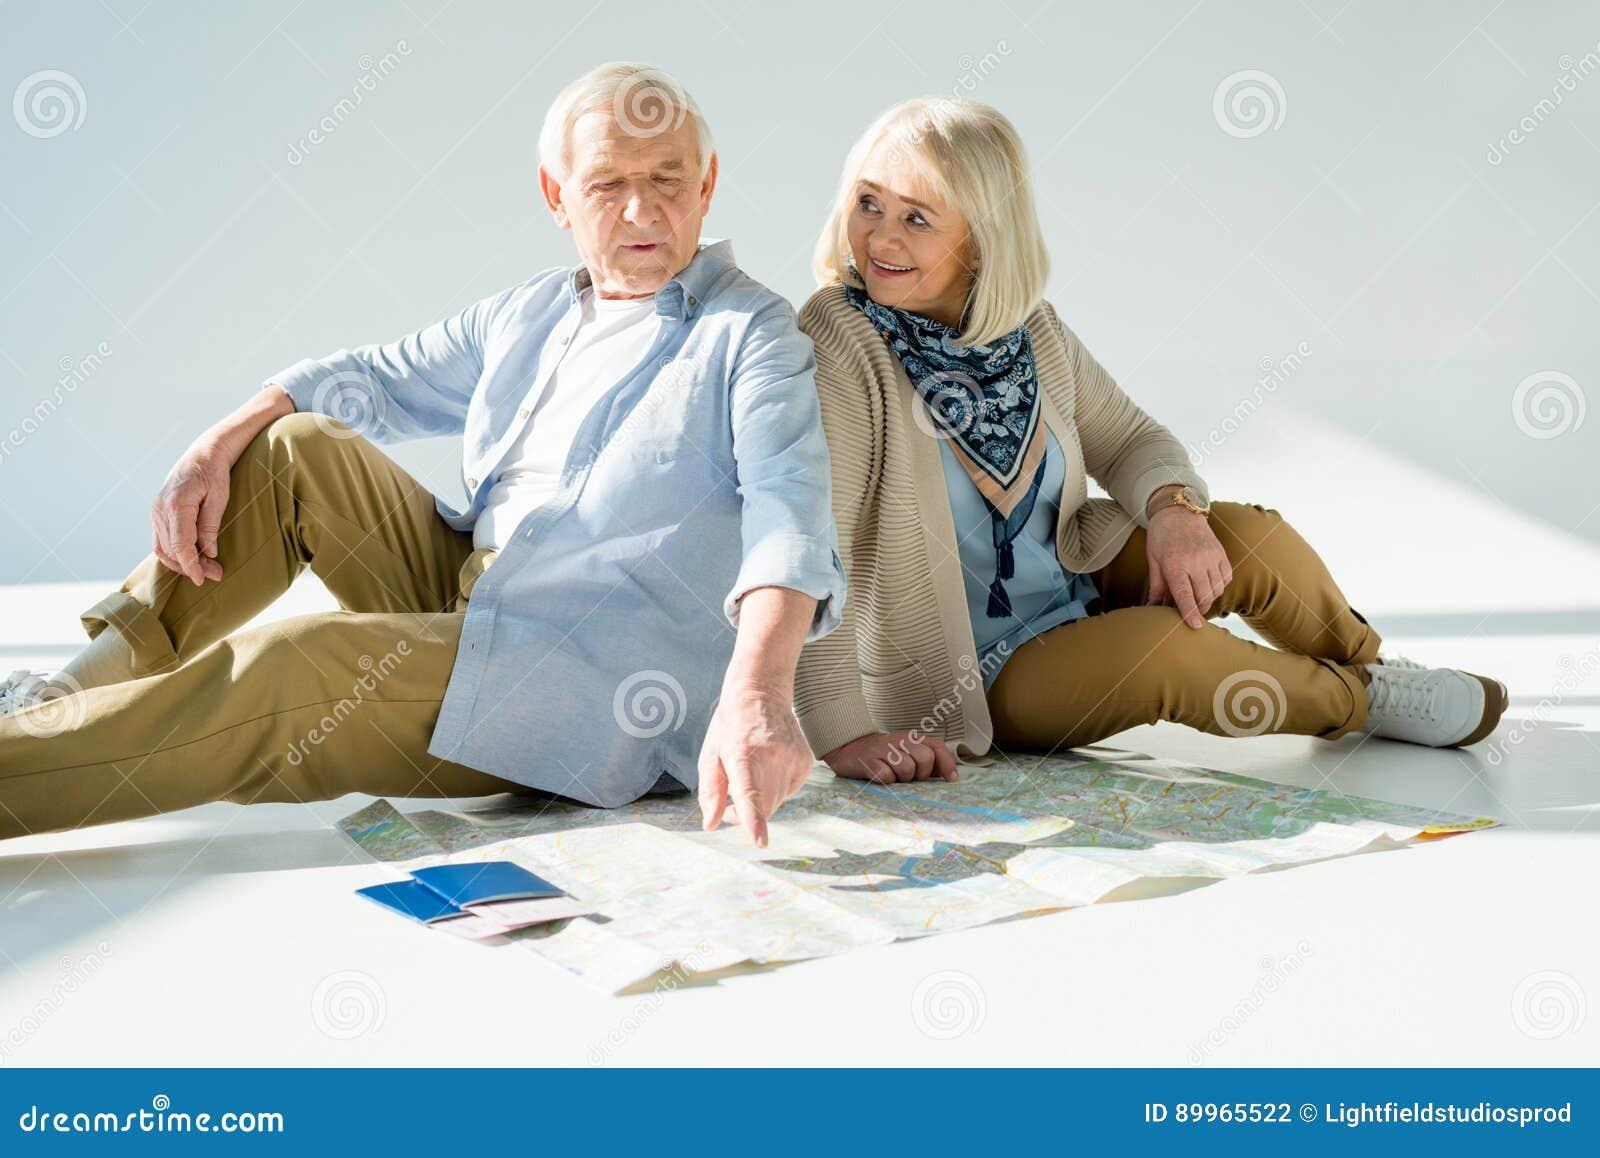 America Jewish Seniors Dating Online Site